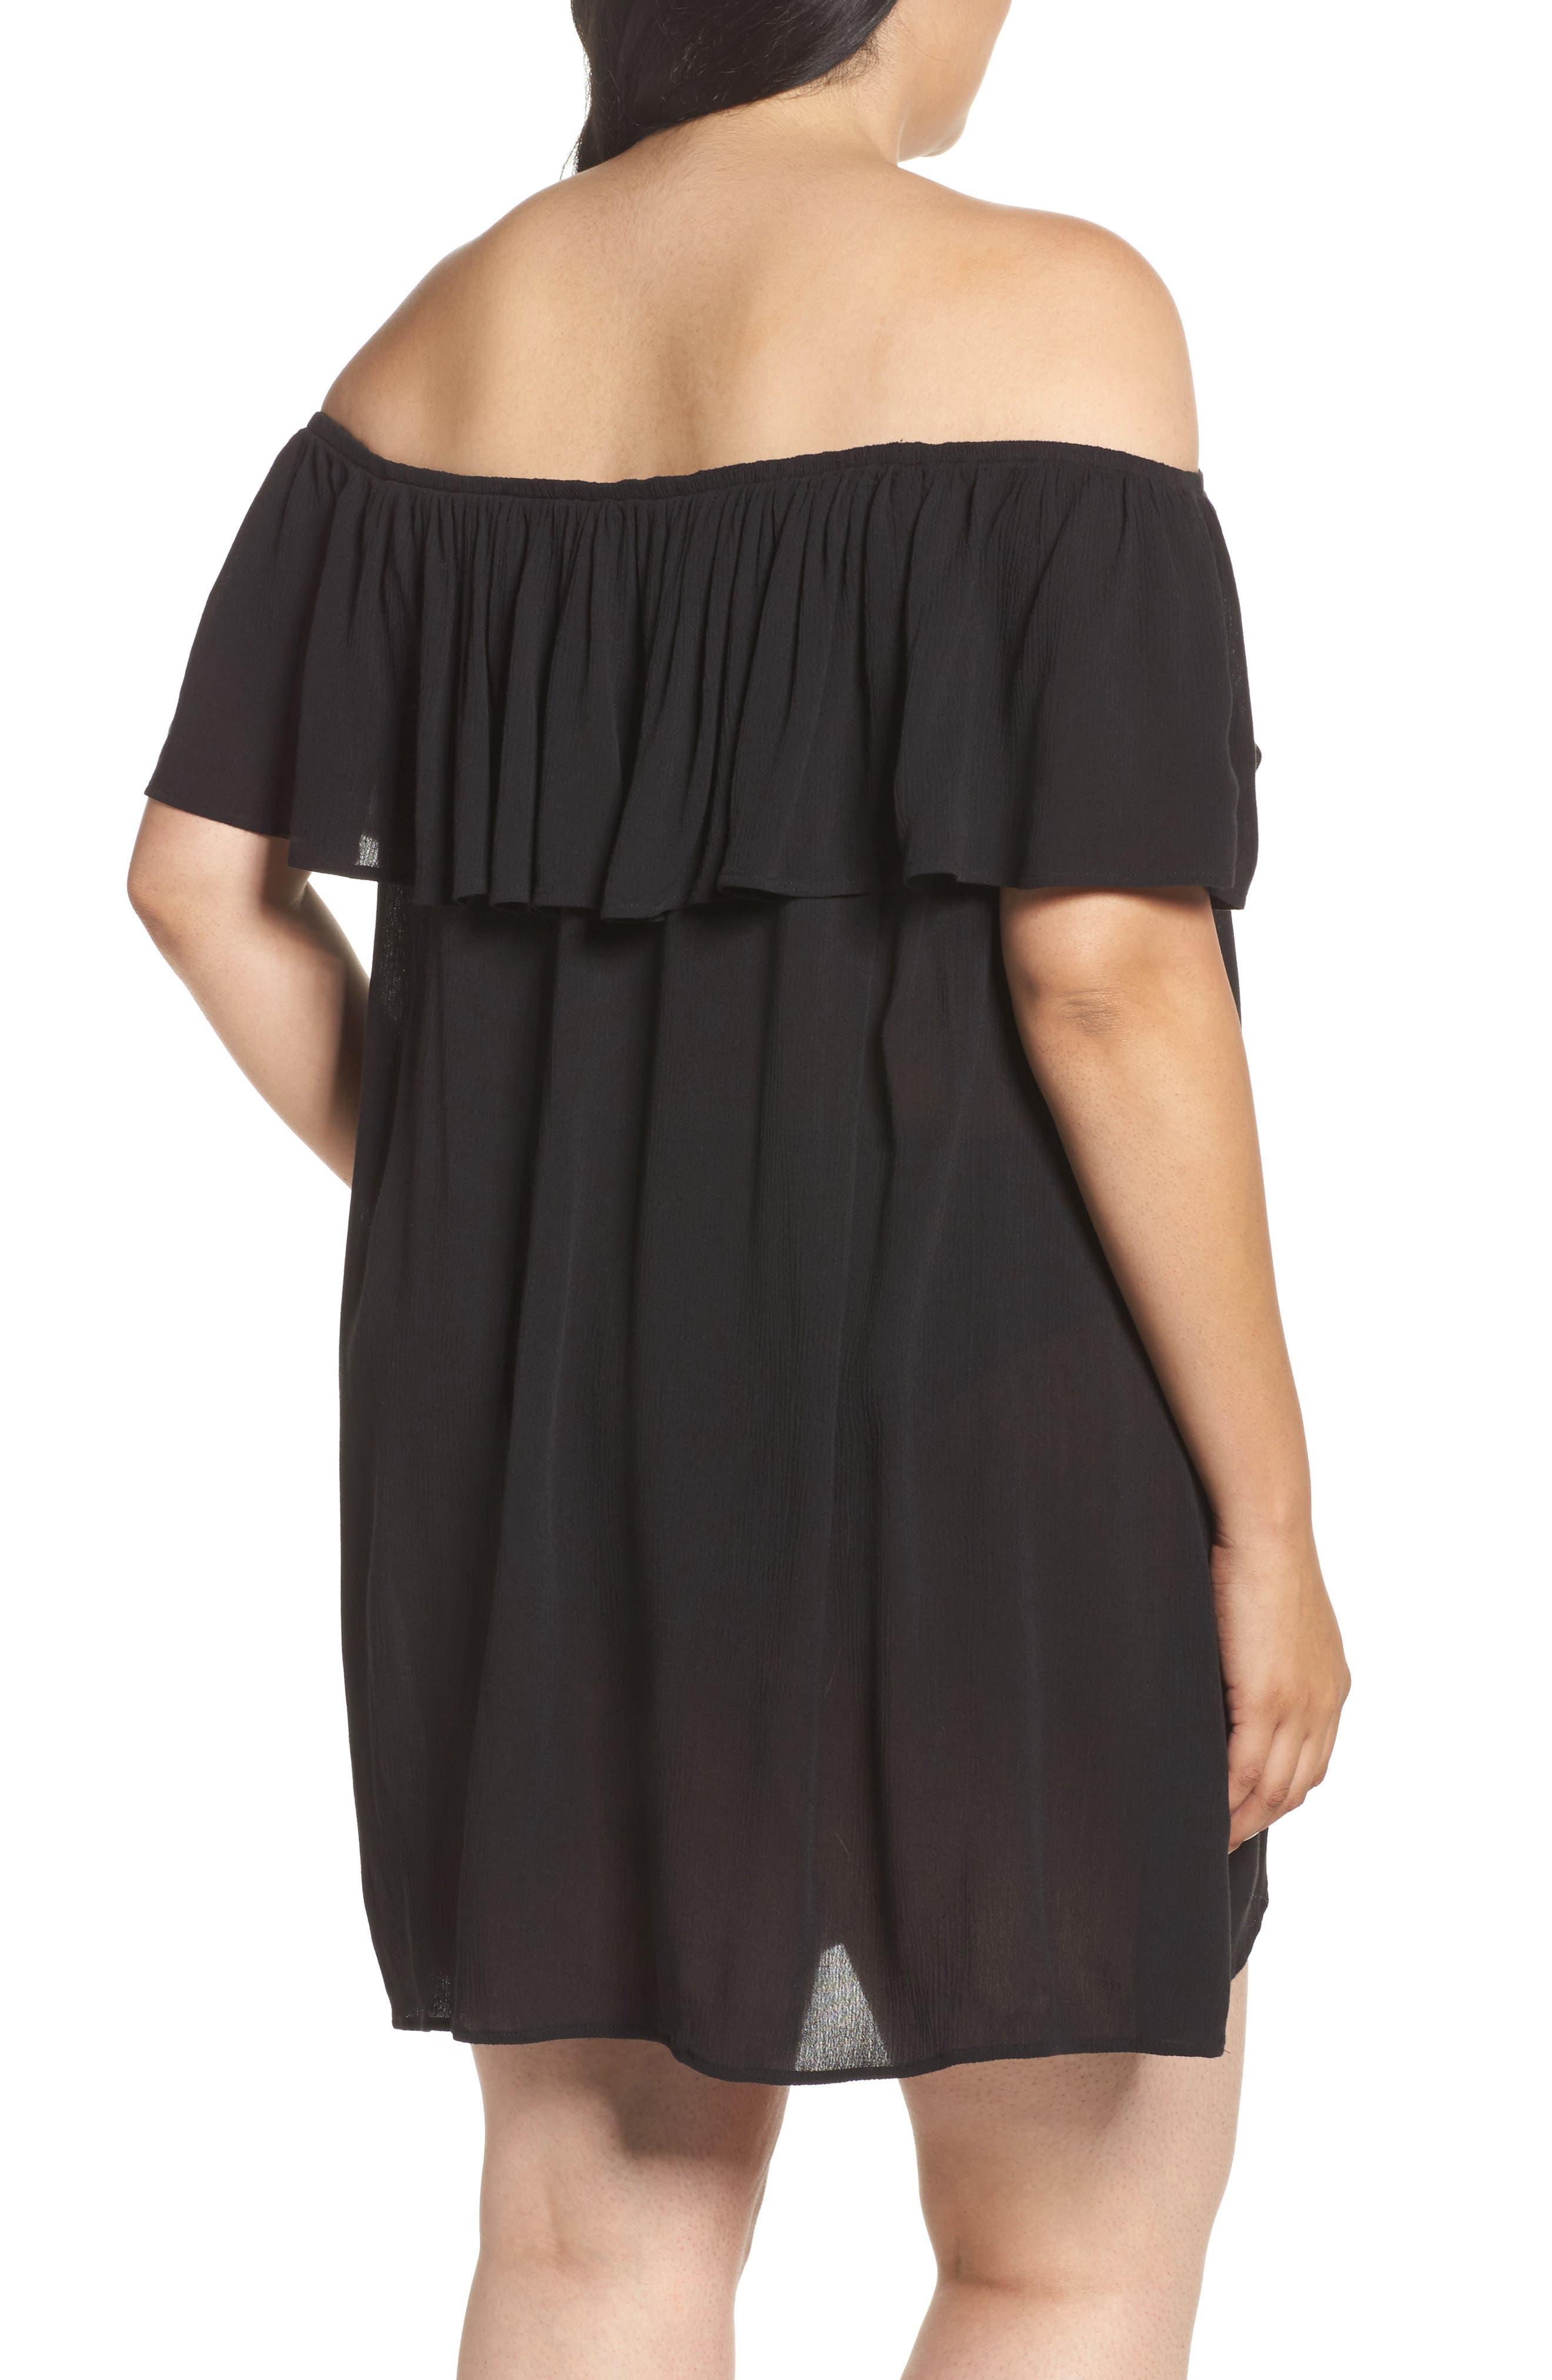 Southern Belle Off the Shoulder Cover-Up Dress,                             Alternate thumbnail 2, color,                             001